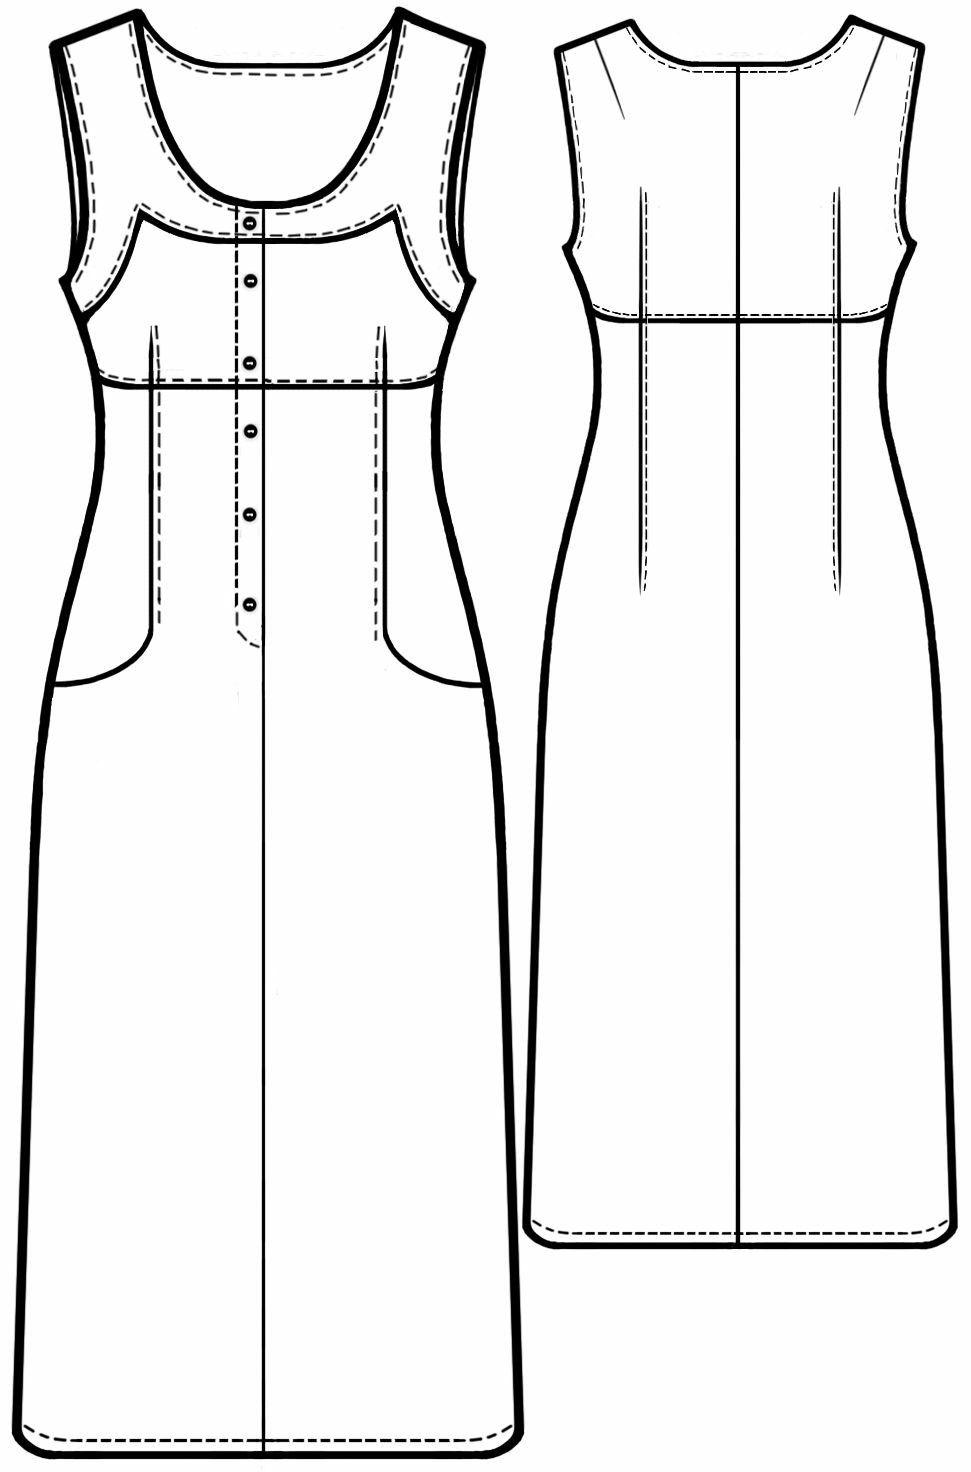 Robe patrons de couture 5617 lekala elbise izimler lekala sewing patterns women dresses sewing patterns made to measure and royalty free jeuxipadfo Choice Image